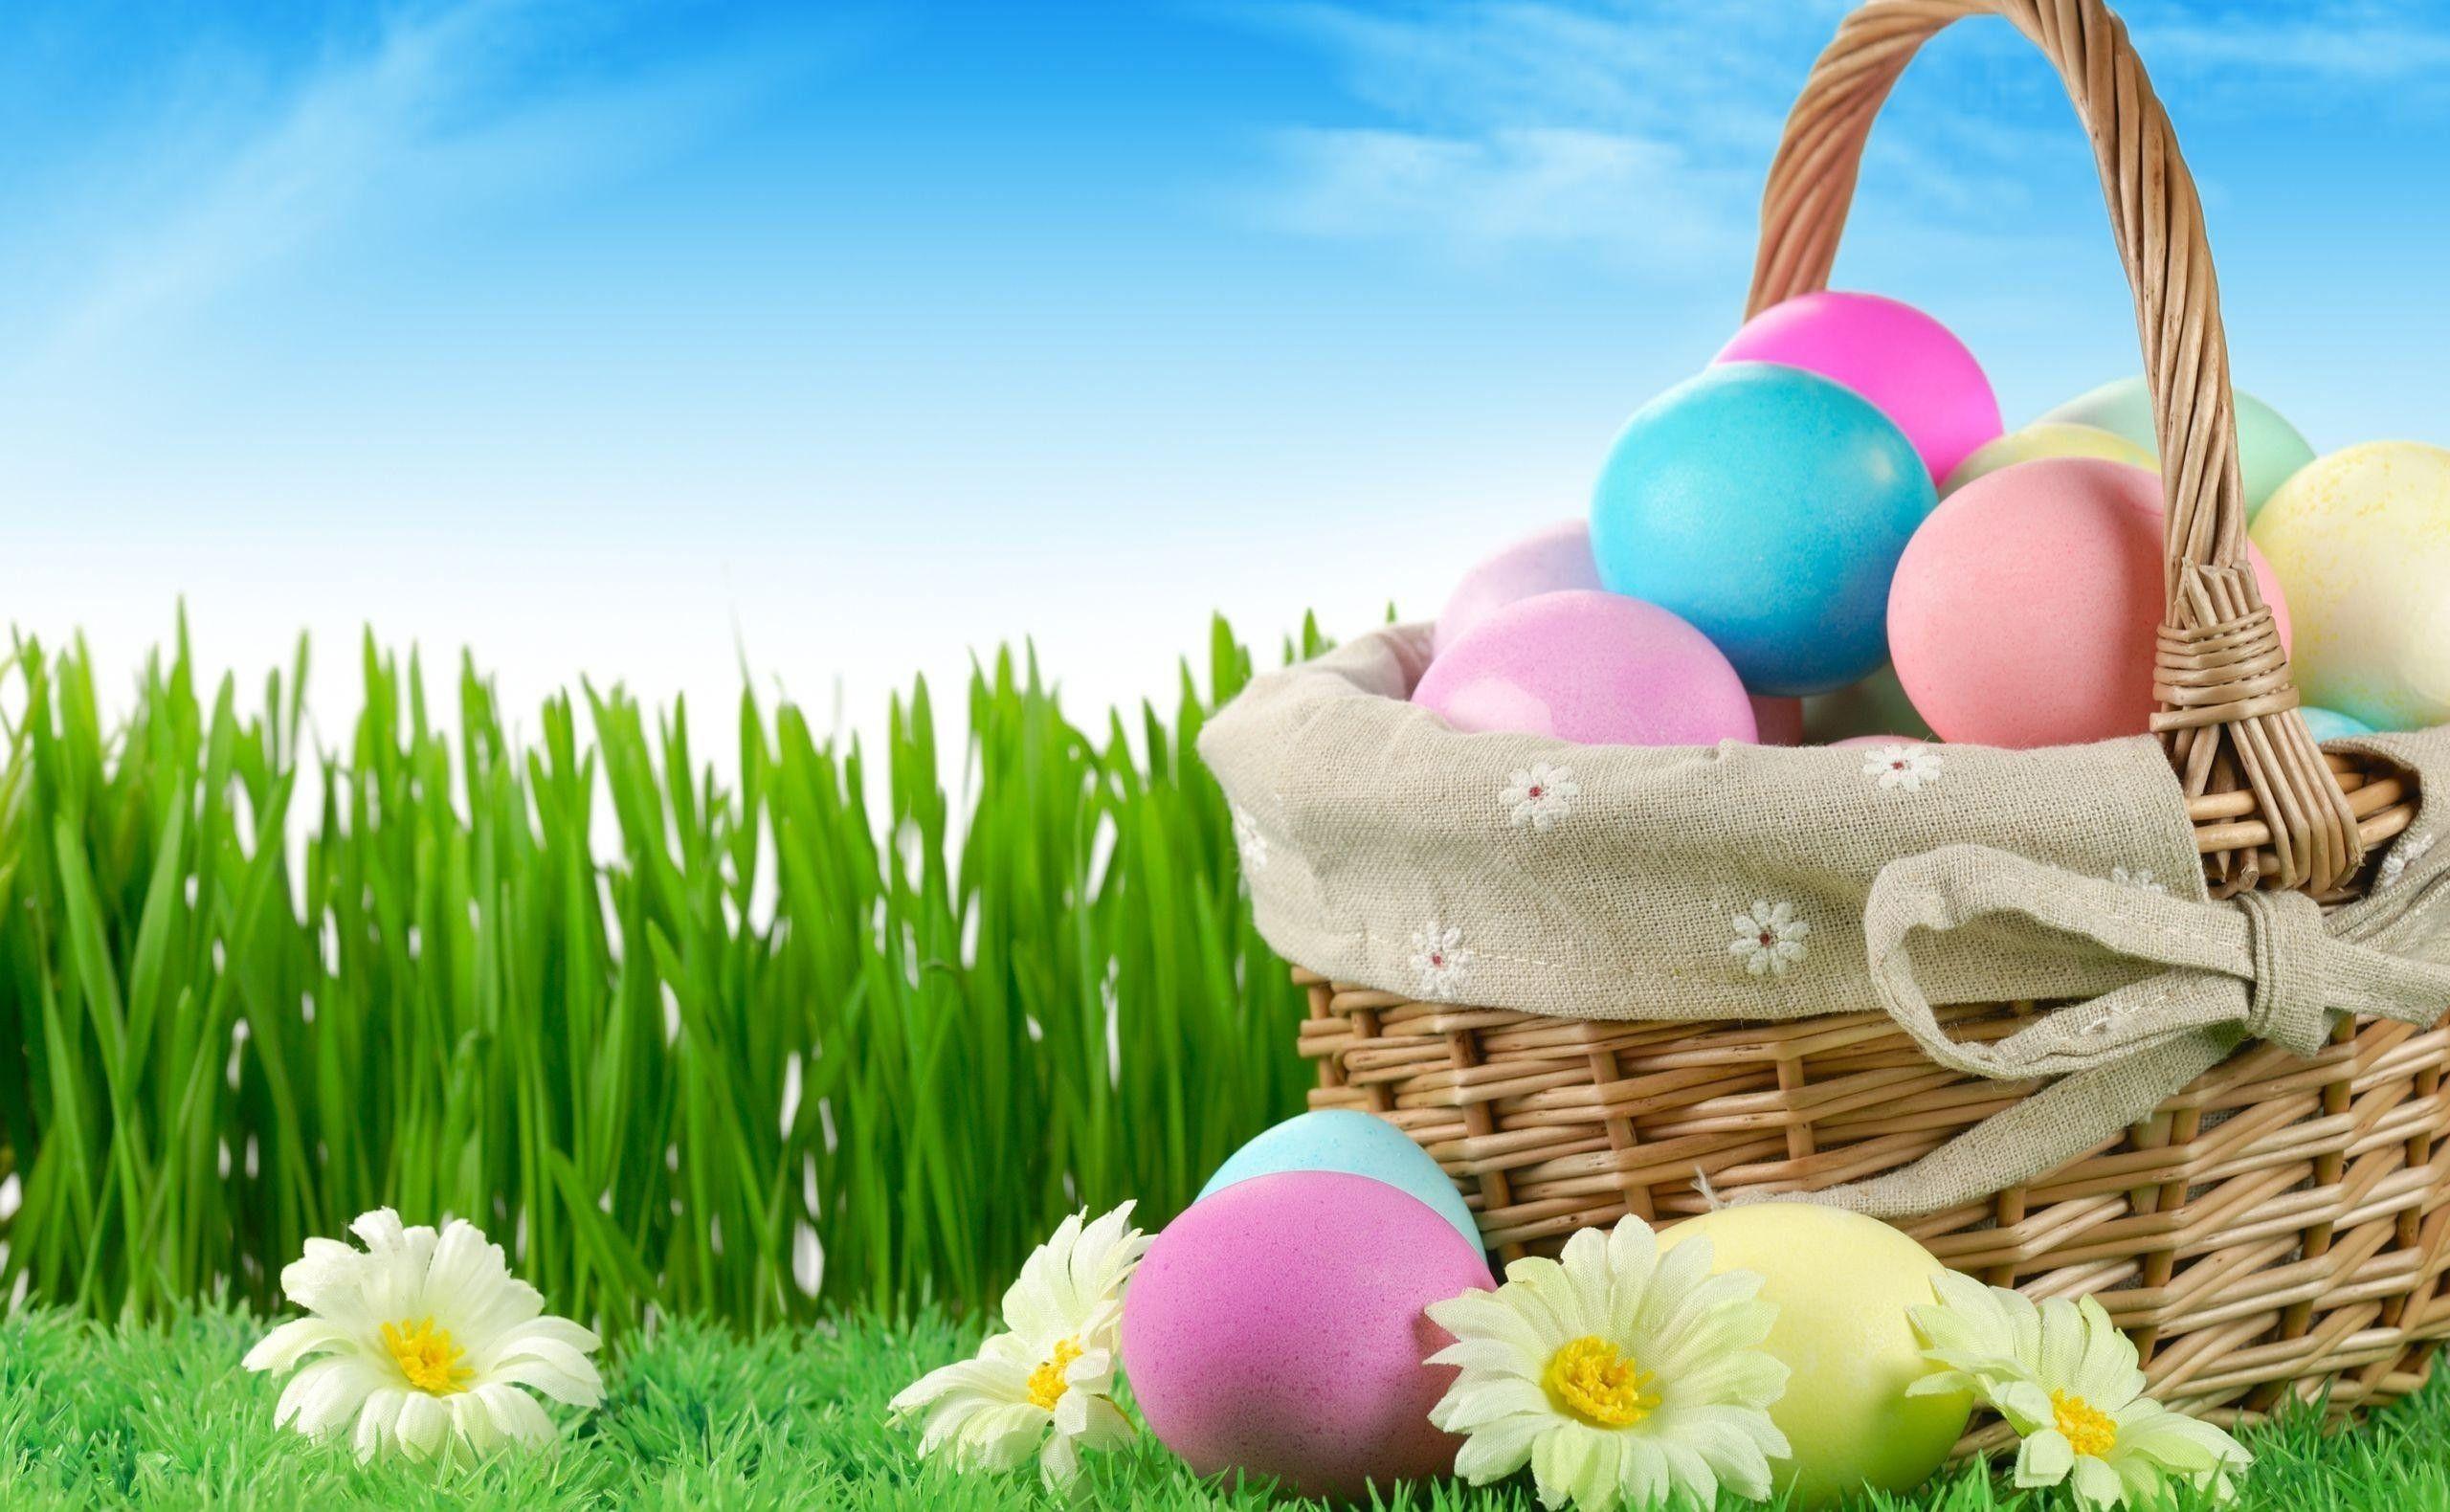 Easter Egg Backgrounds 2560x1580